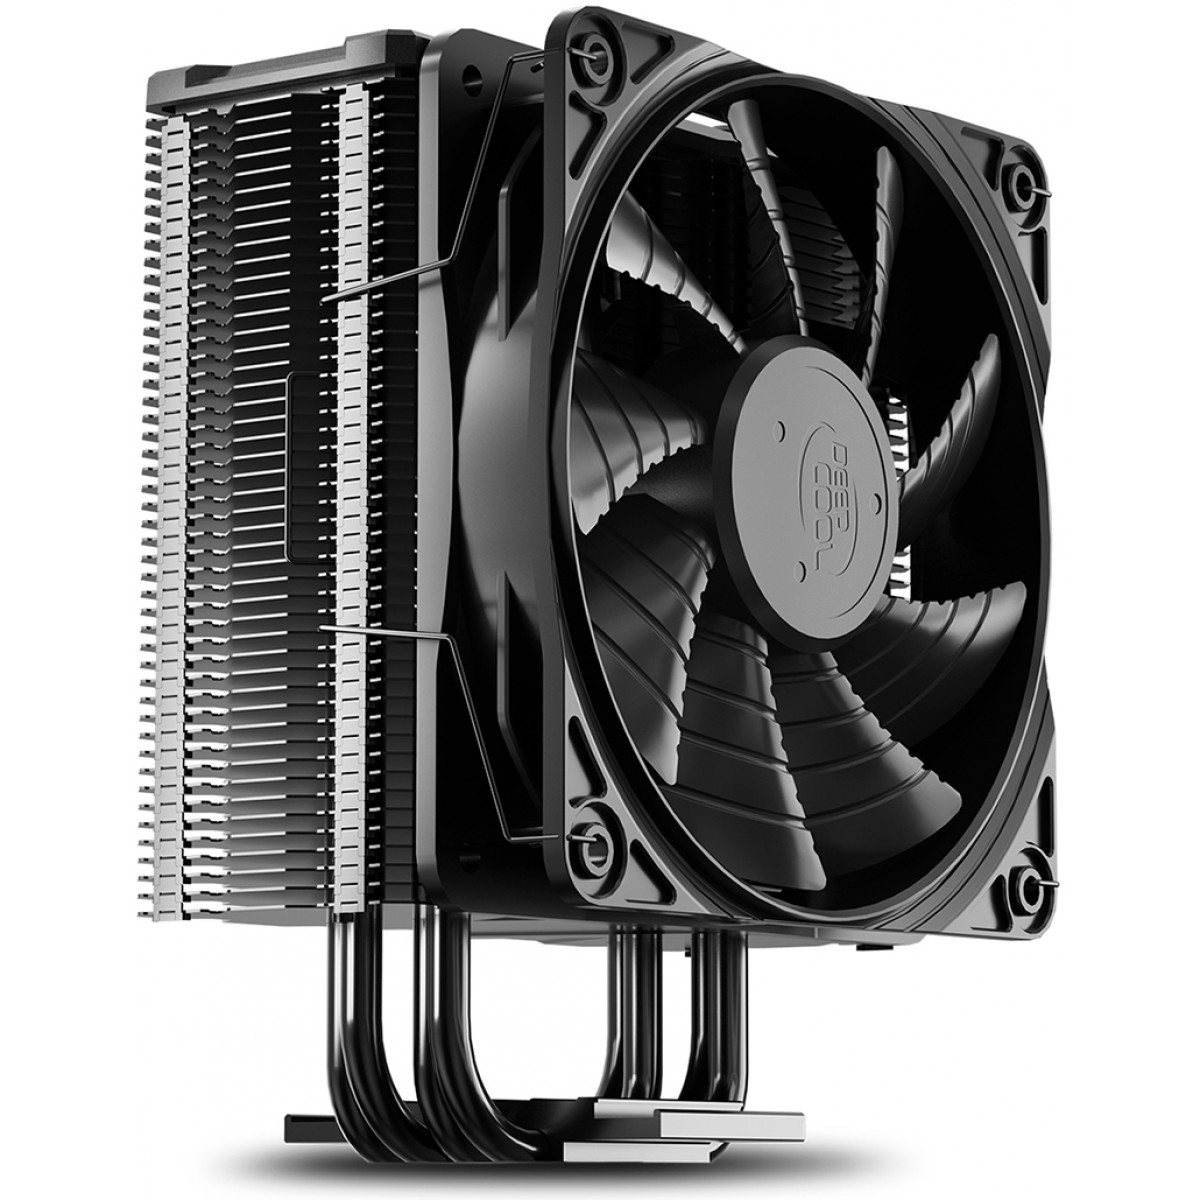 Cooler para Processador DeepCool Gammaxx GTE V2, 120mm, Intel-AMD, Black, DP-MCH4-GMX-GTE-V2BK